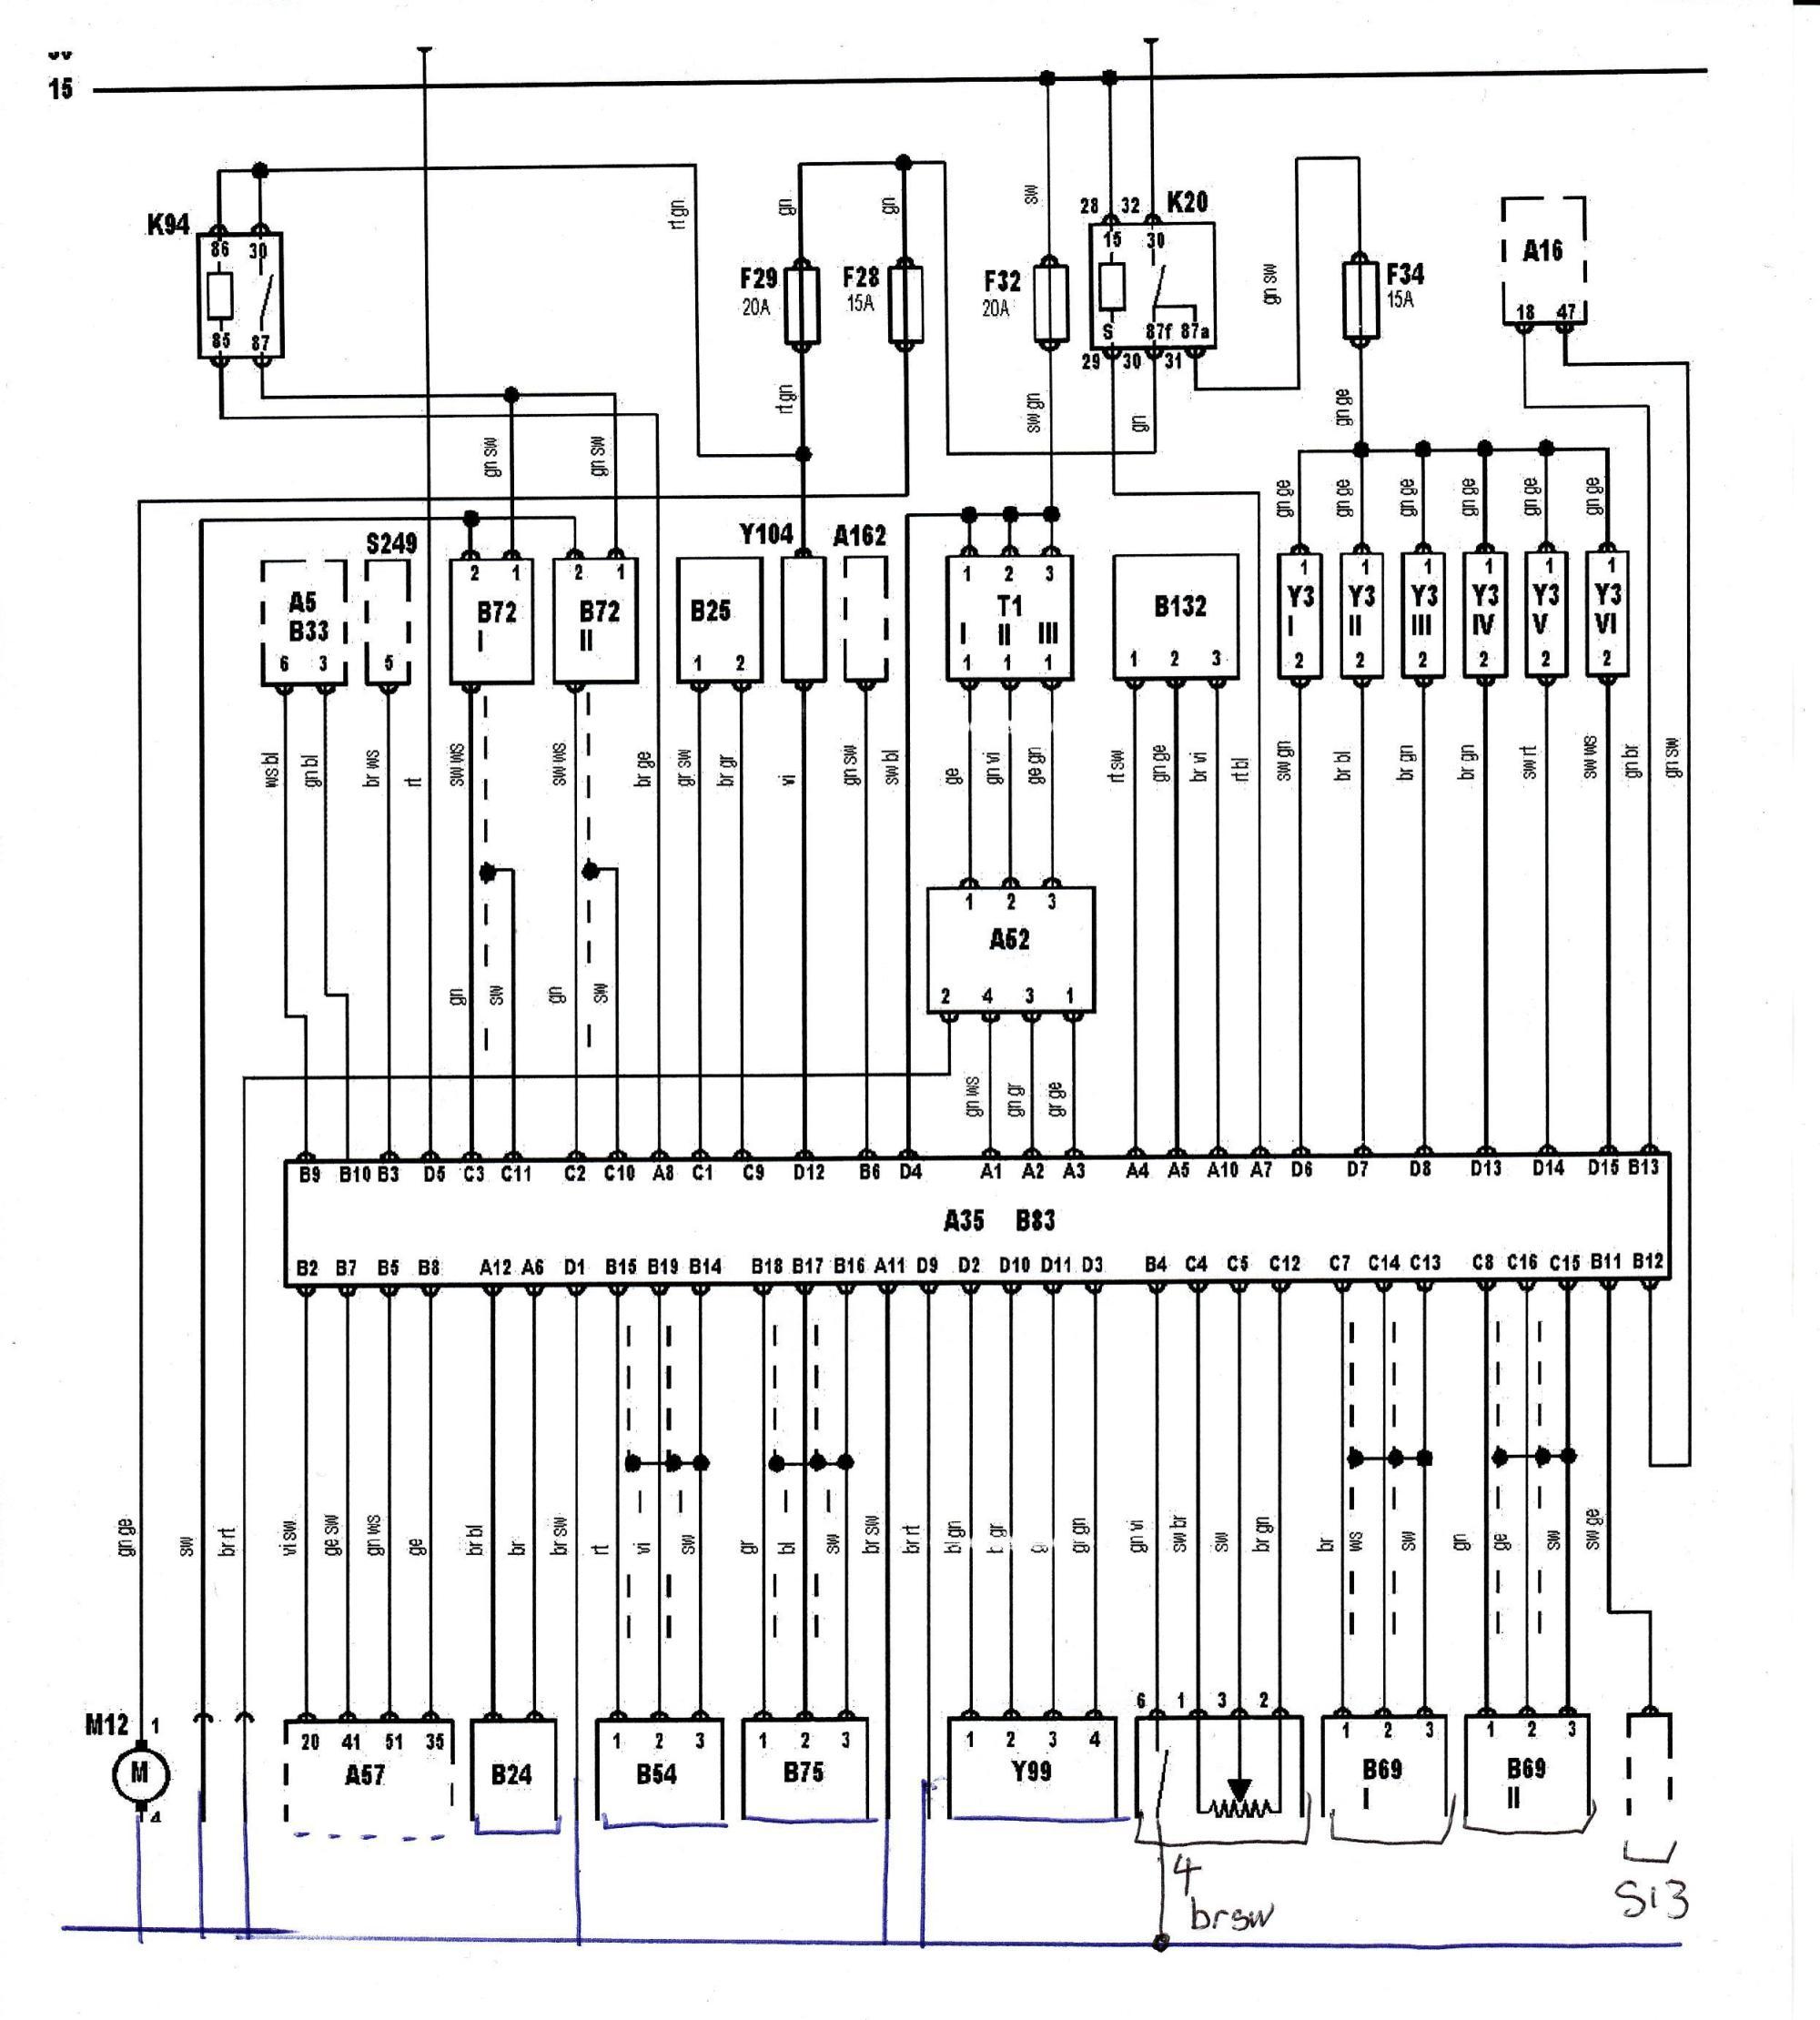 hight resolution of audi c4 wiring diagram wiring diagram schema wiring diagram audi 100 c4 audi 100 wiring diagram